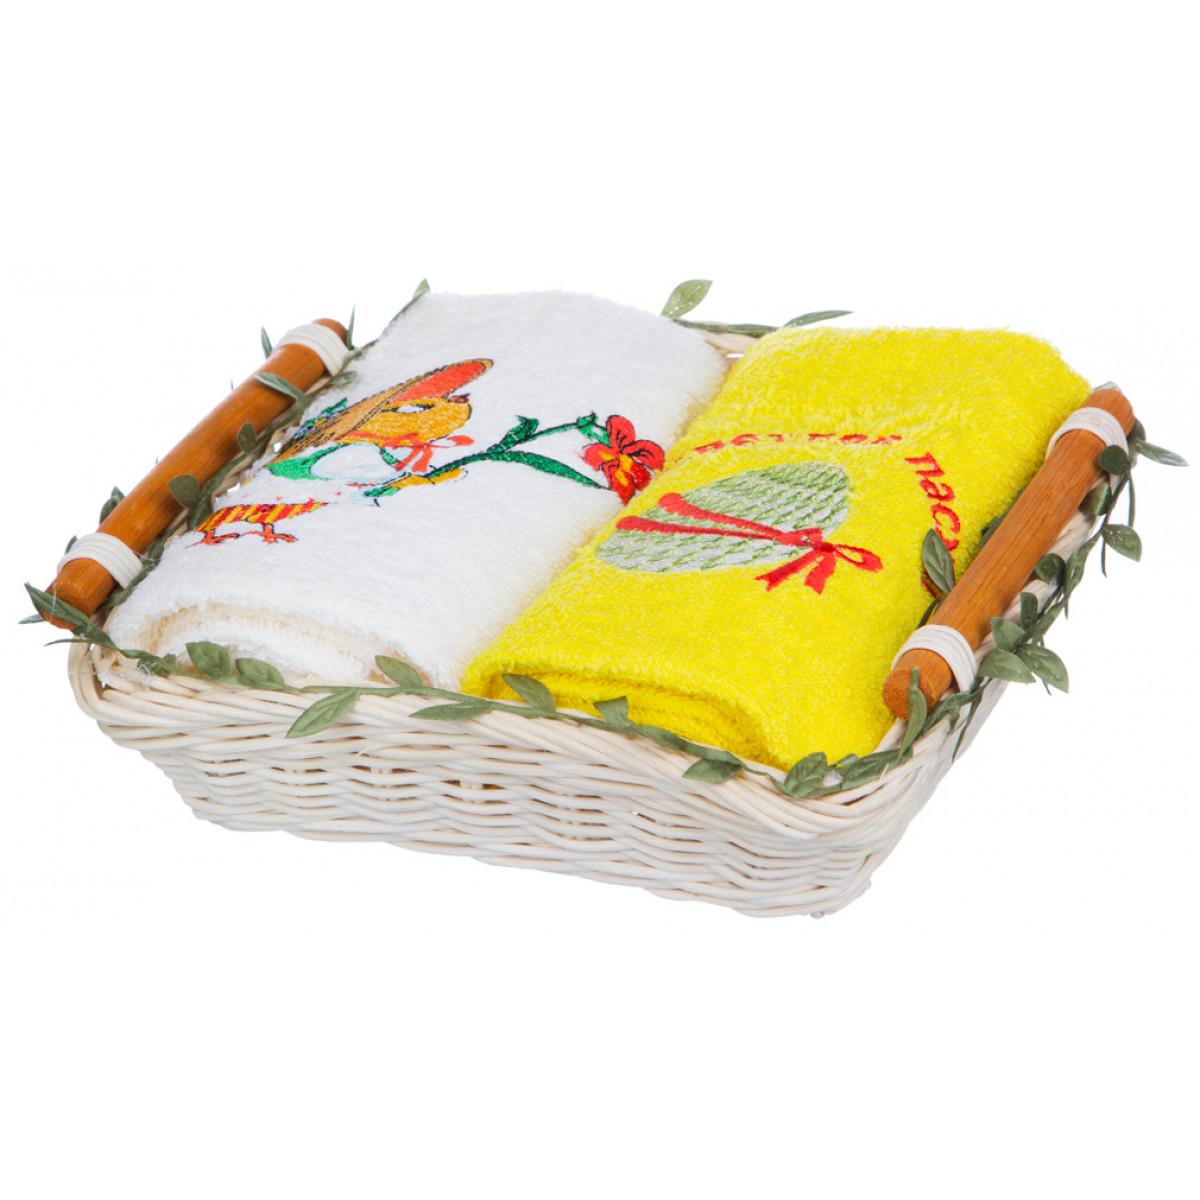 Рукавицы, прихватки, фартуки Santalino Кухонный набор Abagale рукавицы прихватки фартуки santalino салфетки пасхальная корзина цвет белый 40х40 см 3 шт